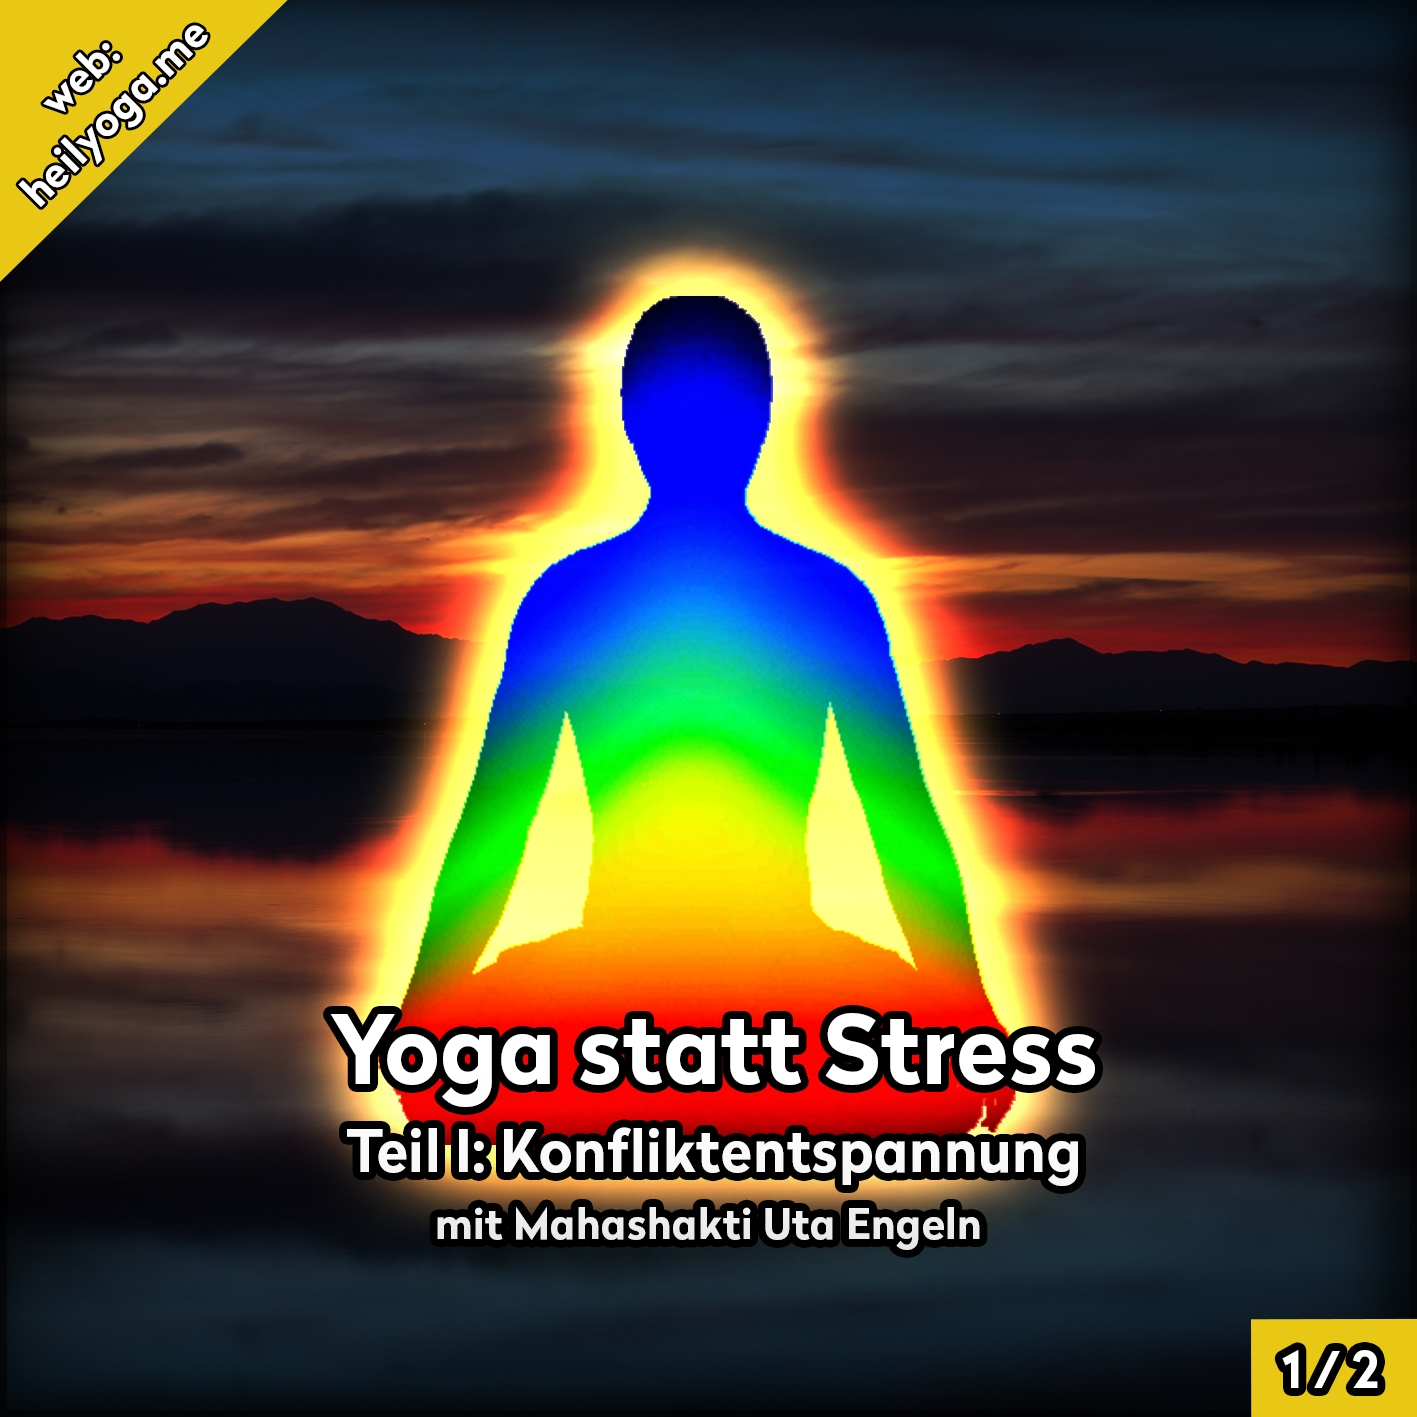 Yoga statt Stress - Stress abbauen